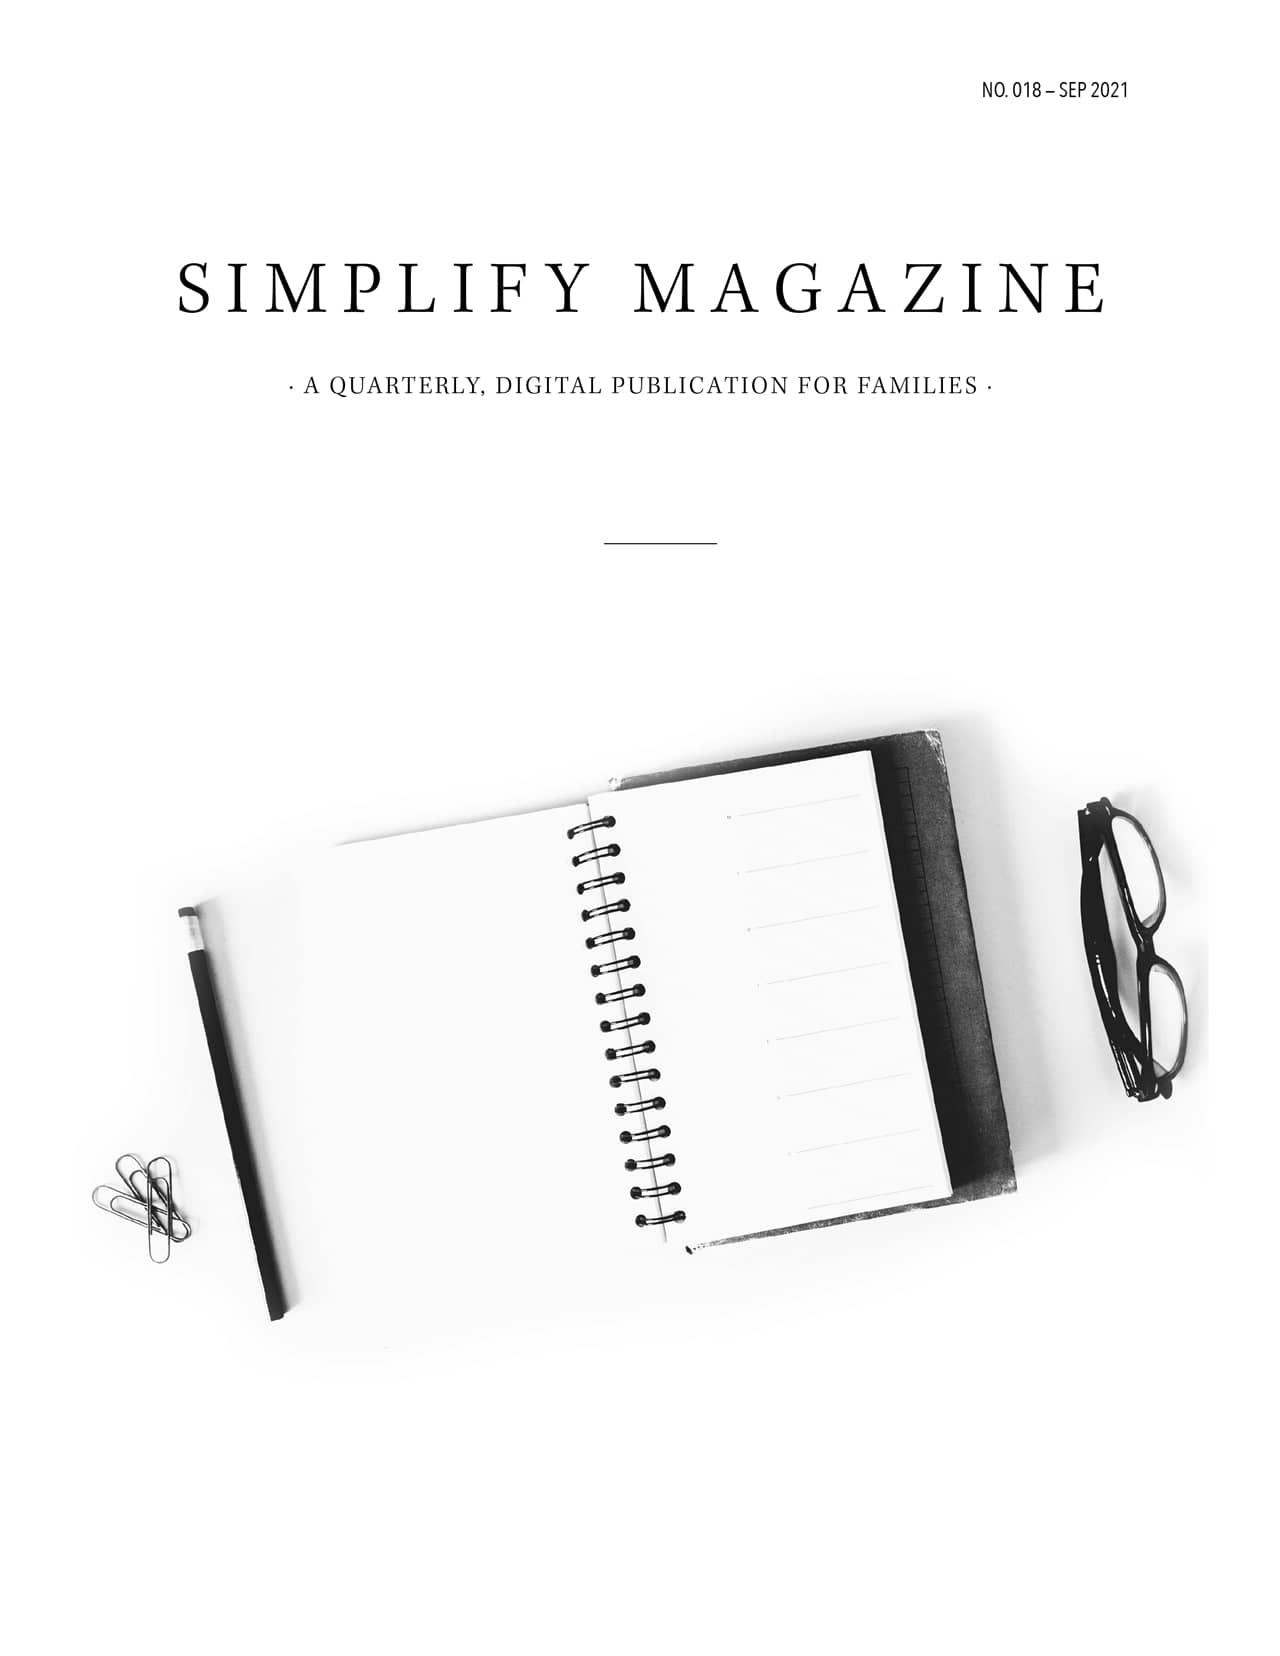 Simplify Magazine Issue #018